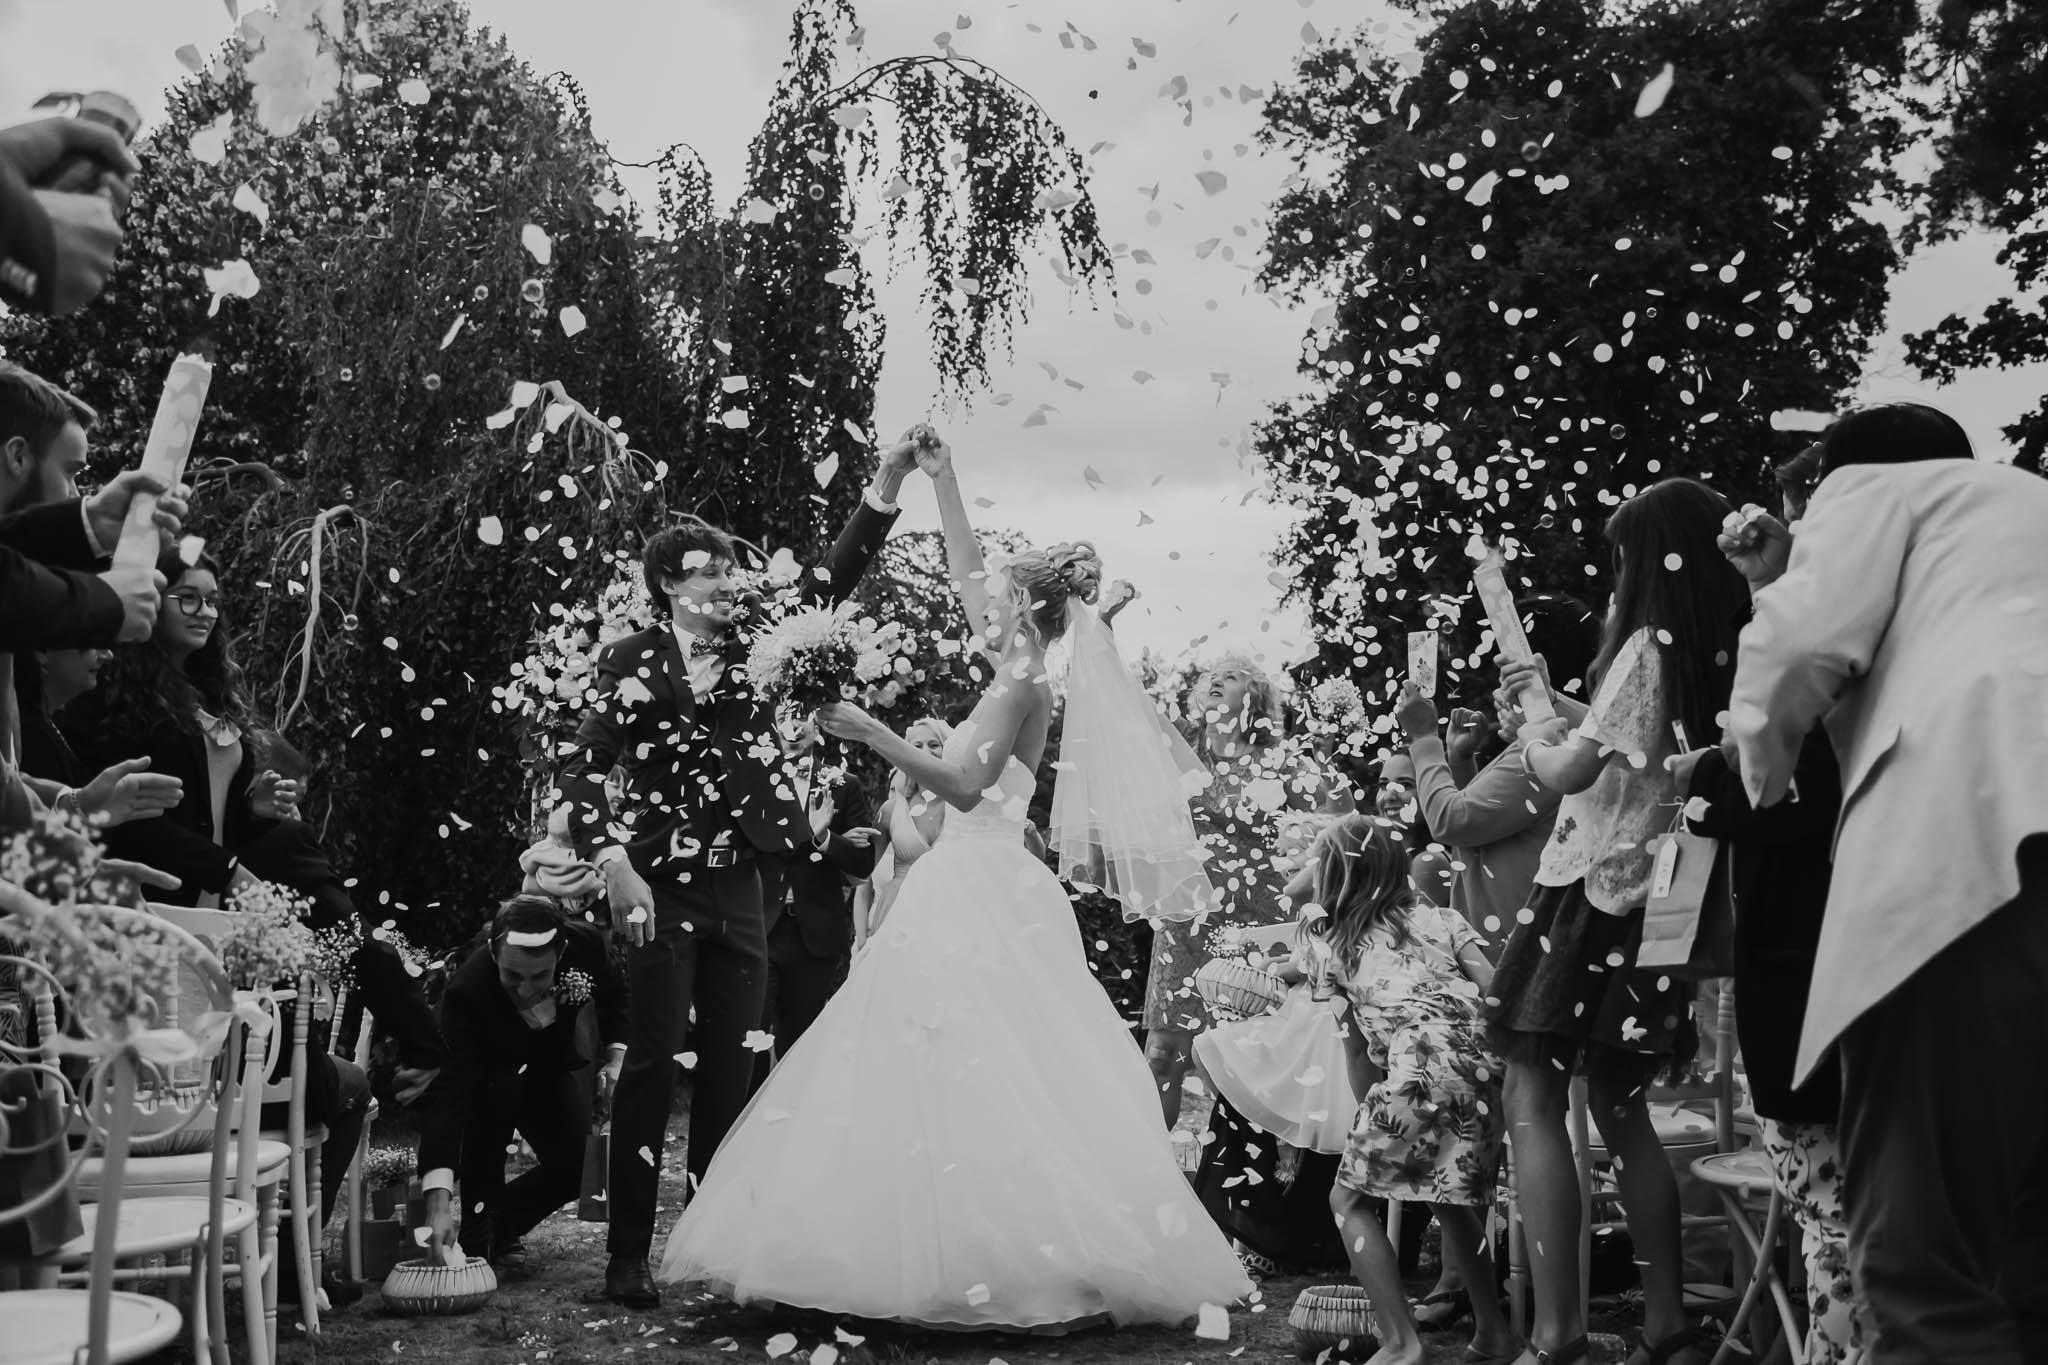 mariage-chateau-gaudras-ingold-55.jpg